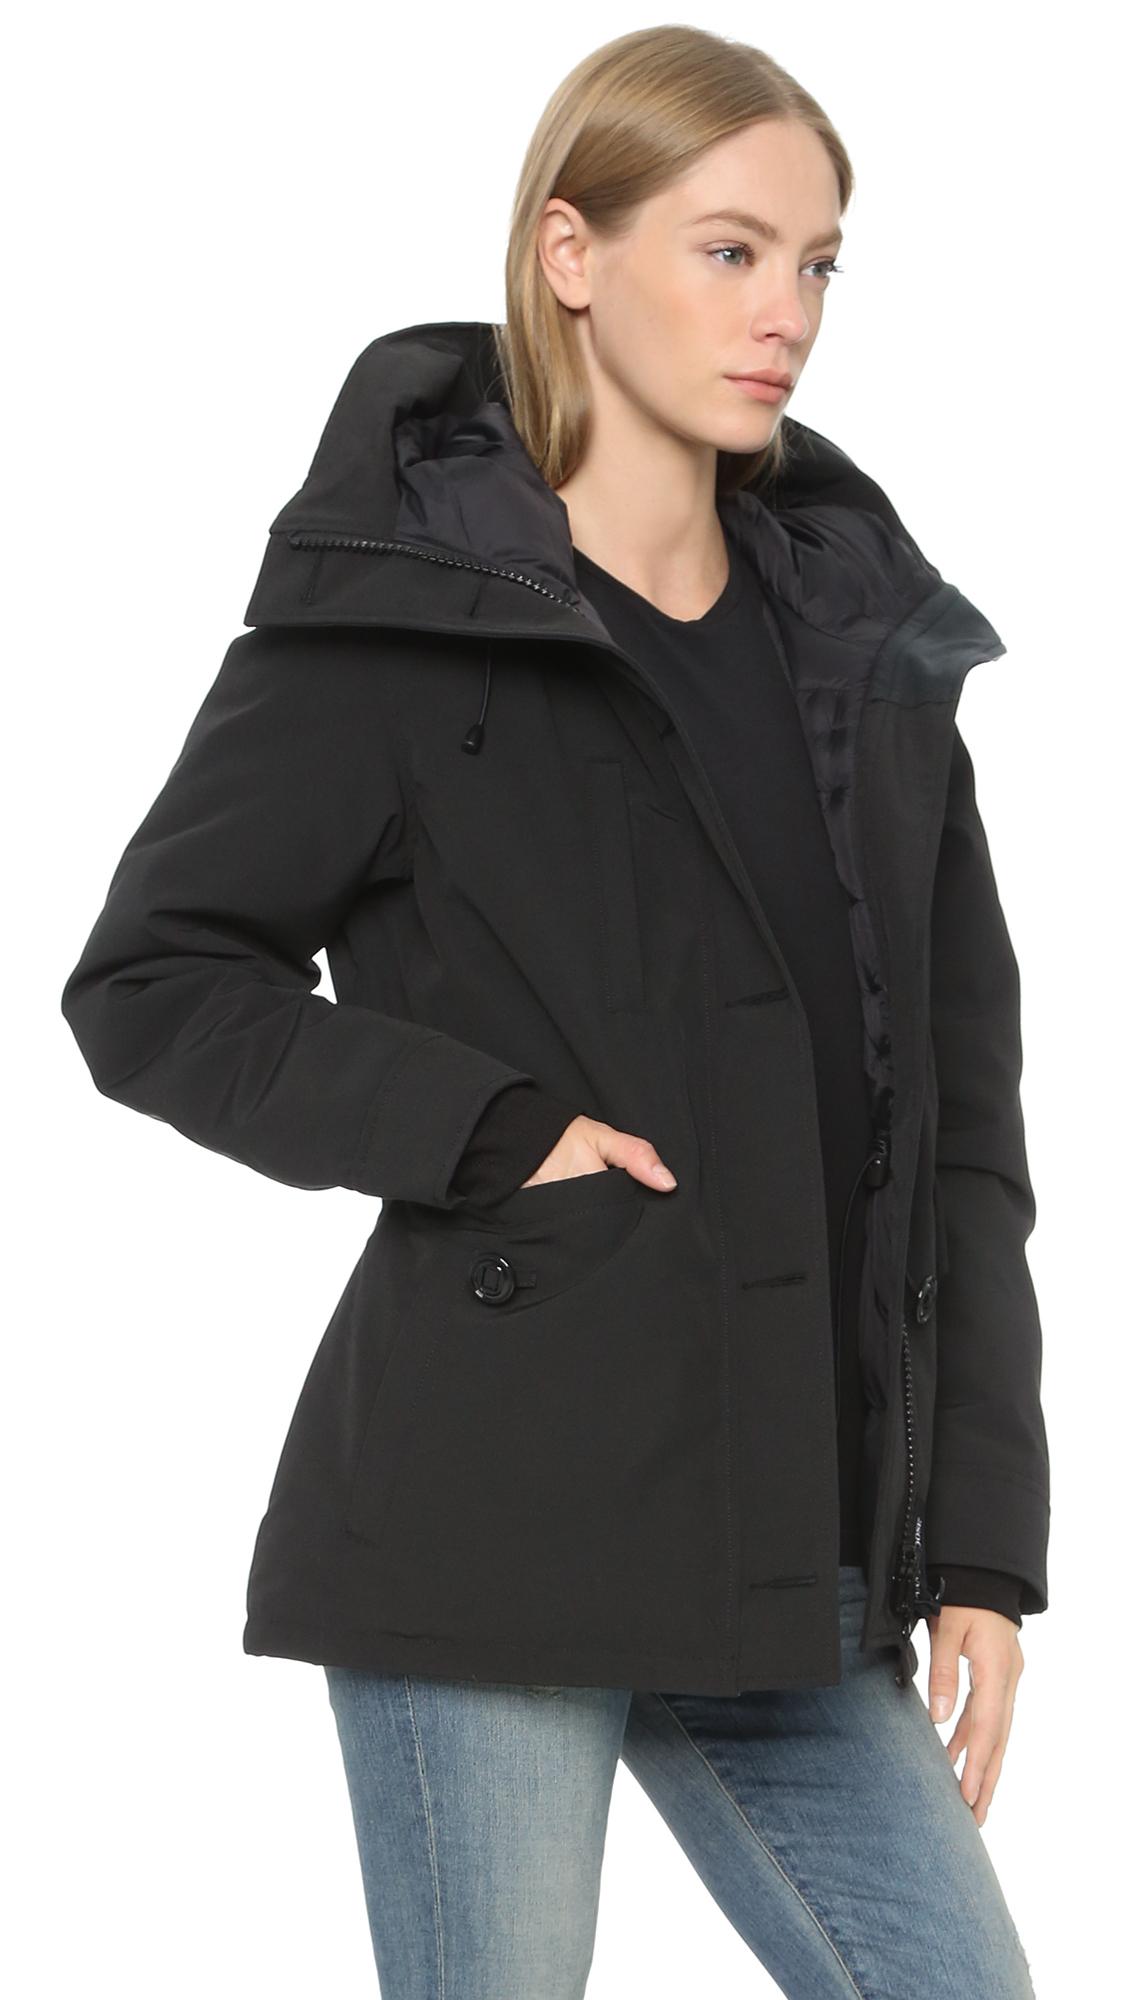 canada goose rideau parka in black lyst